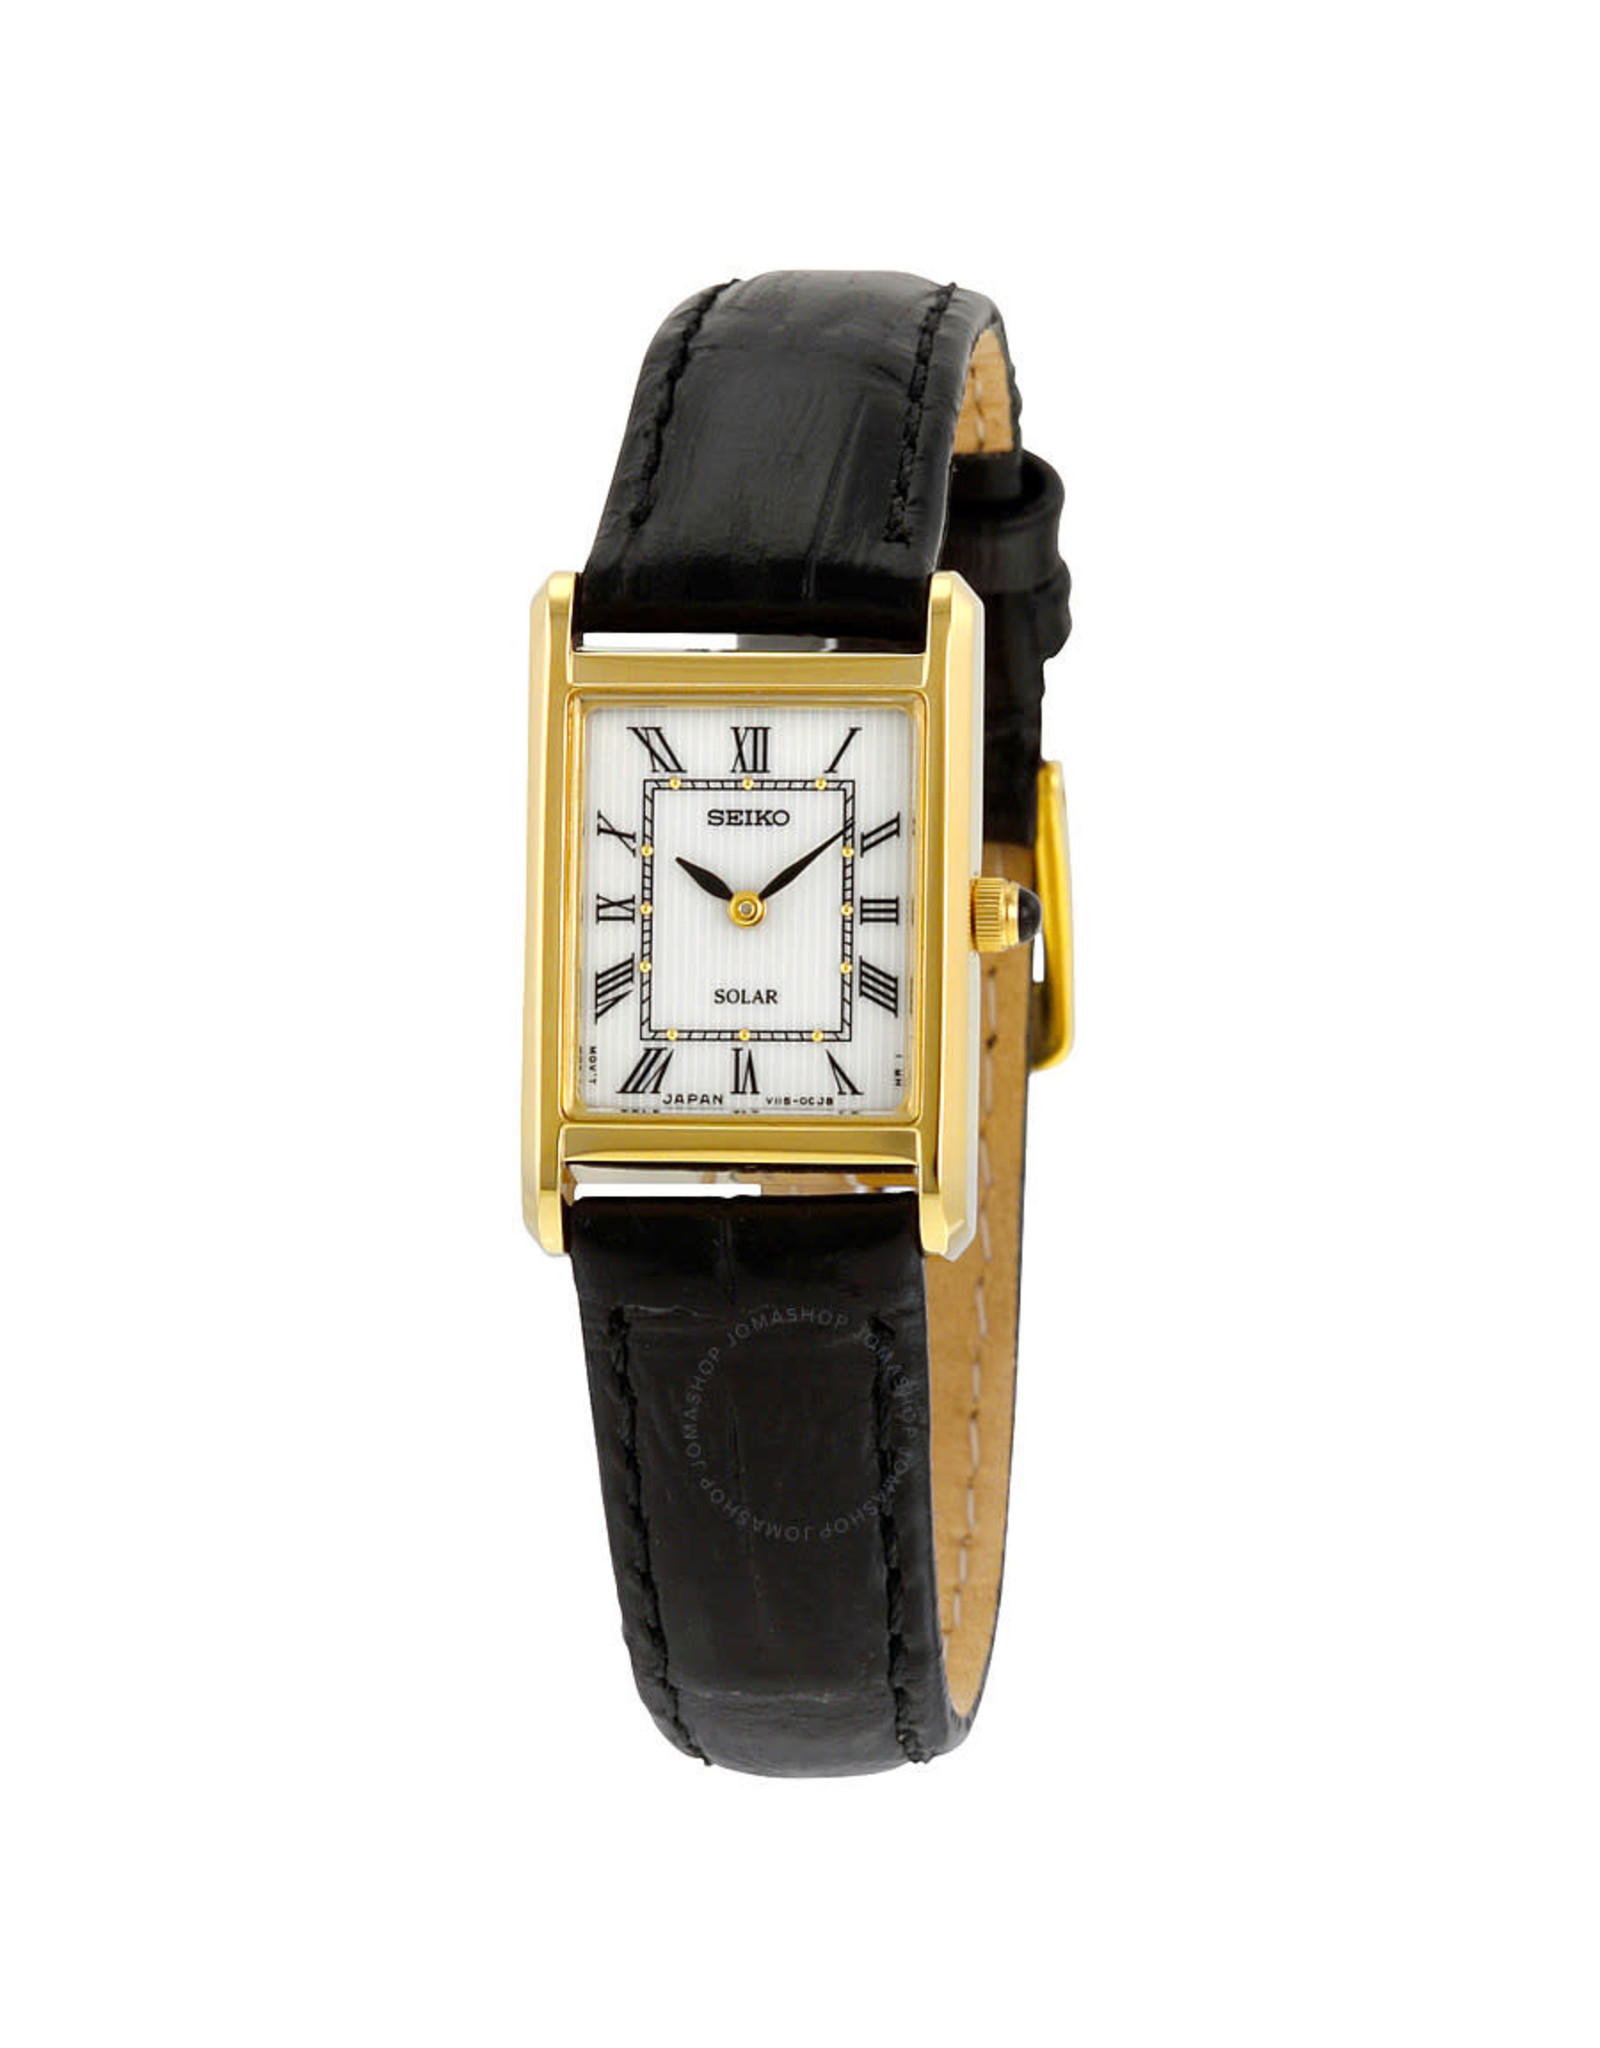 Ladies Seiko Solar Rectangular Roman Numeral Watch, 18mm